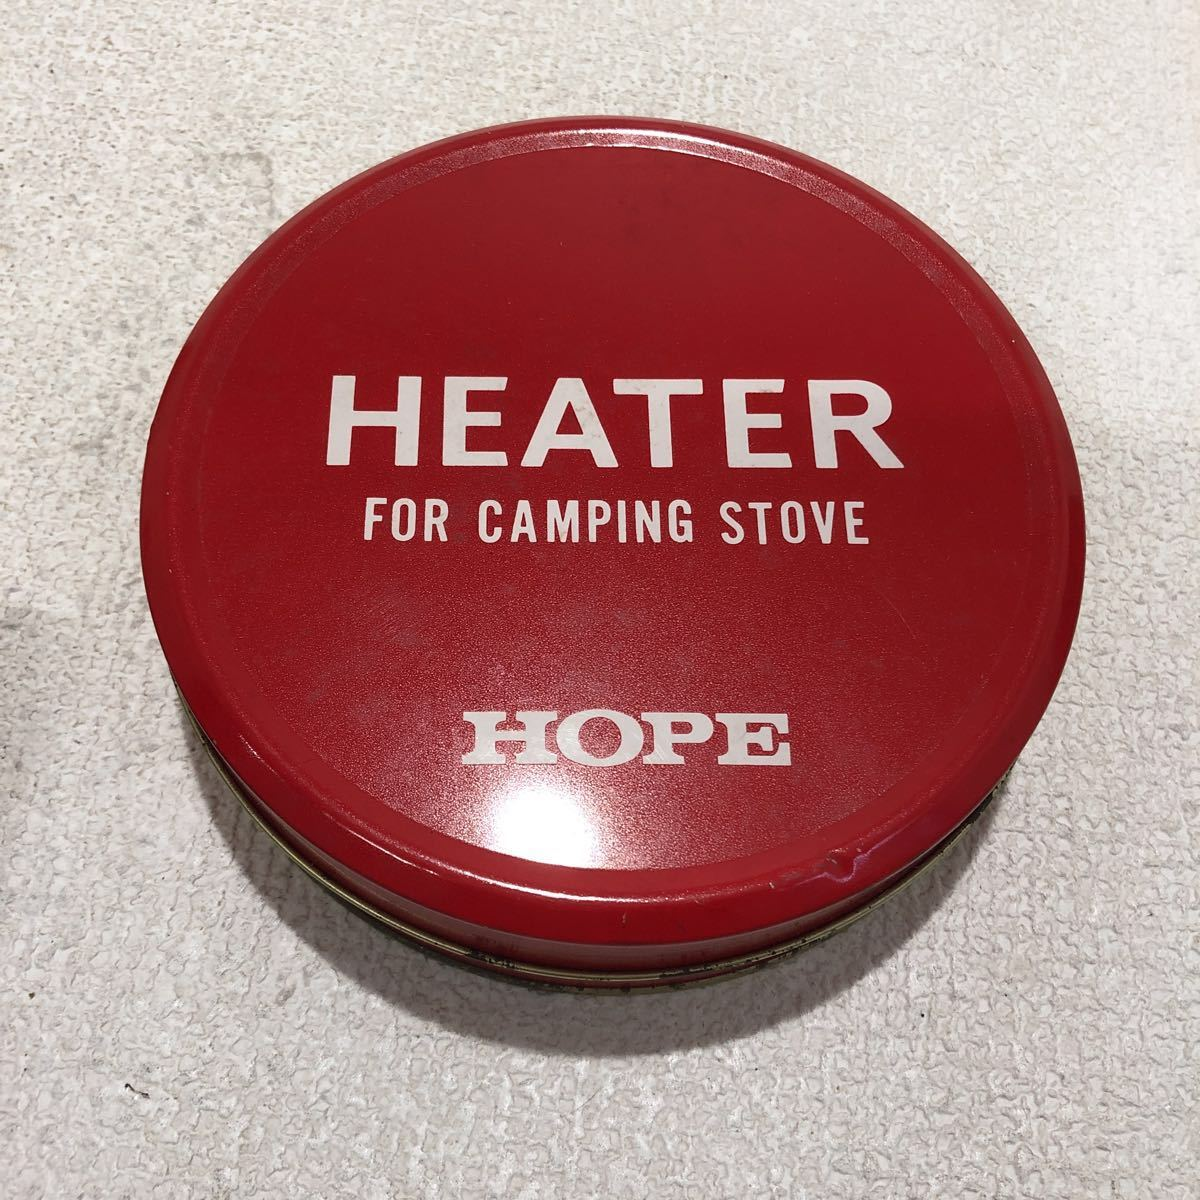 HOPE ホープ キャンピングヒーター 暖房器 キャンピングストーブ 日本製 アウトドアグッズ キャンプ HEATER FOR CAMPING STOVE 20190722_画像3